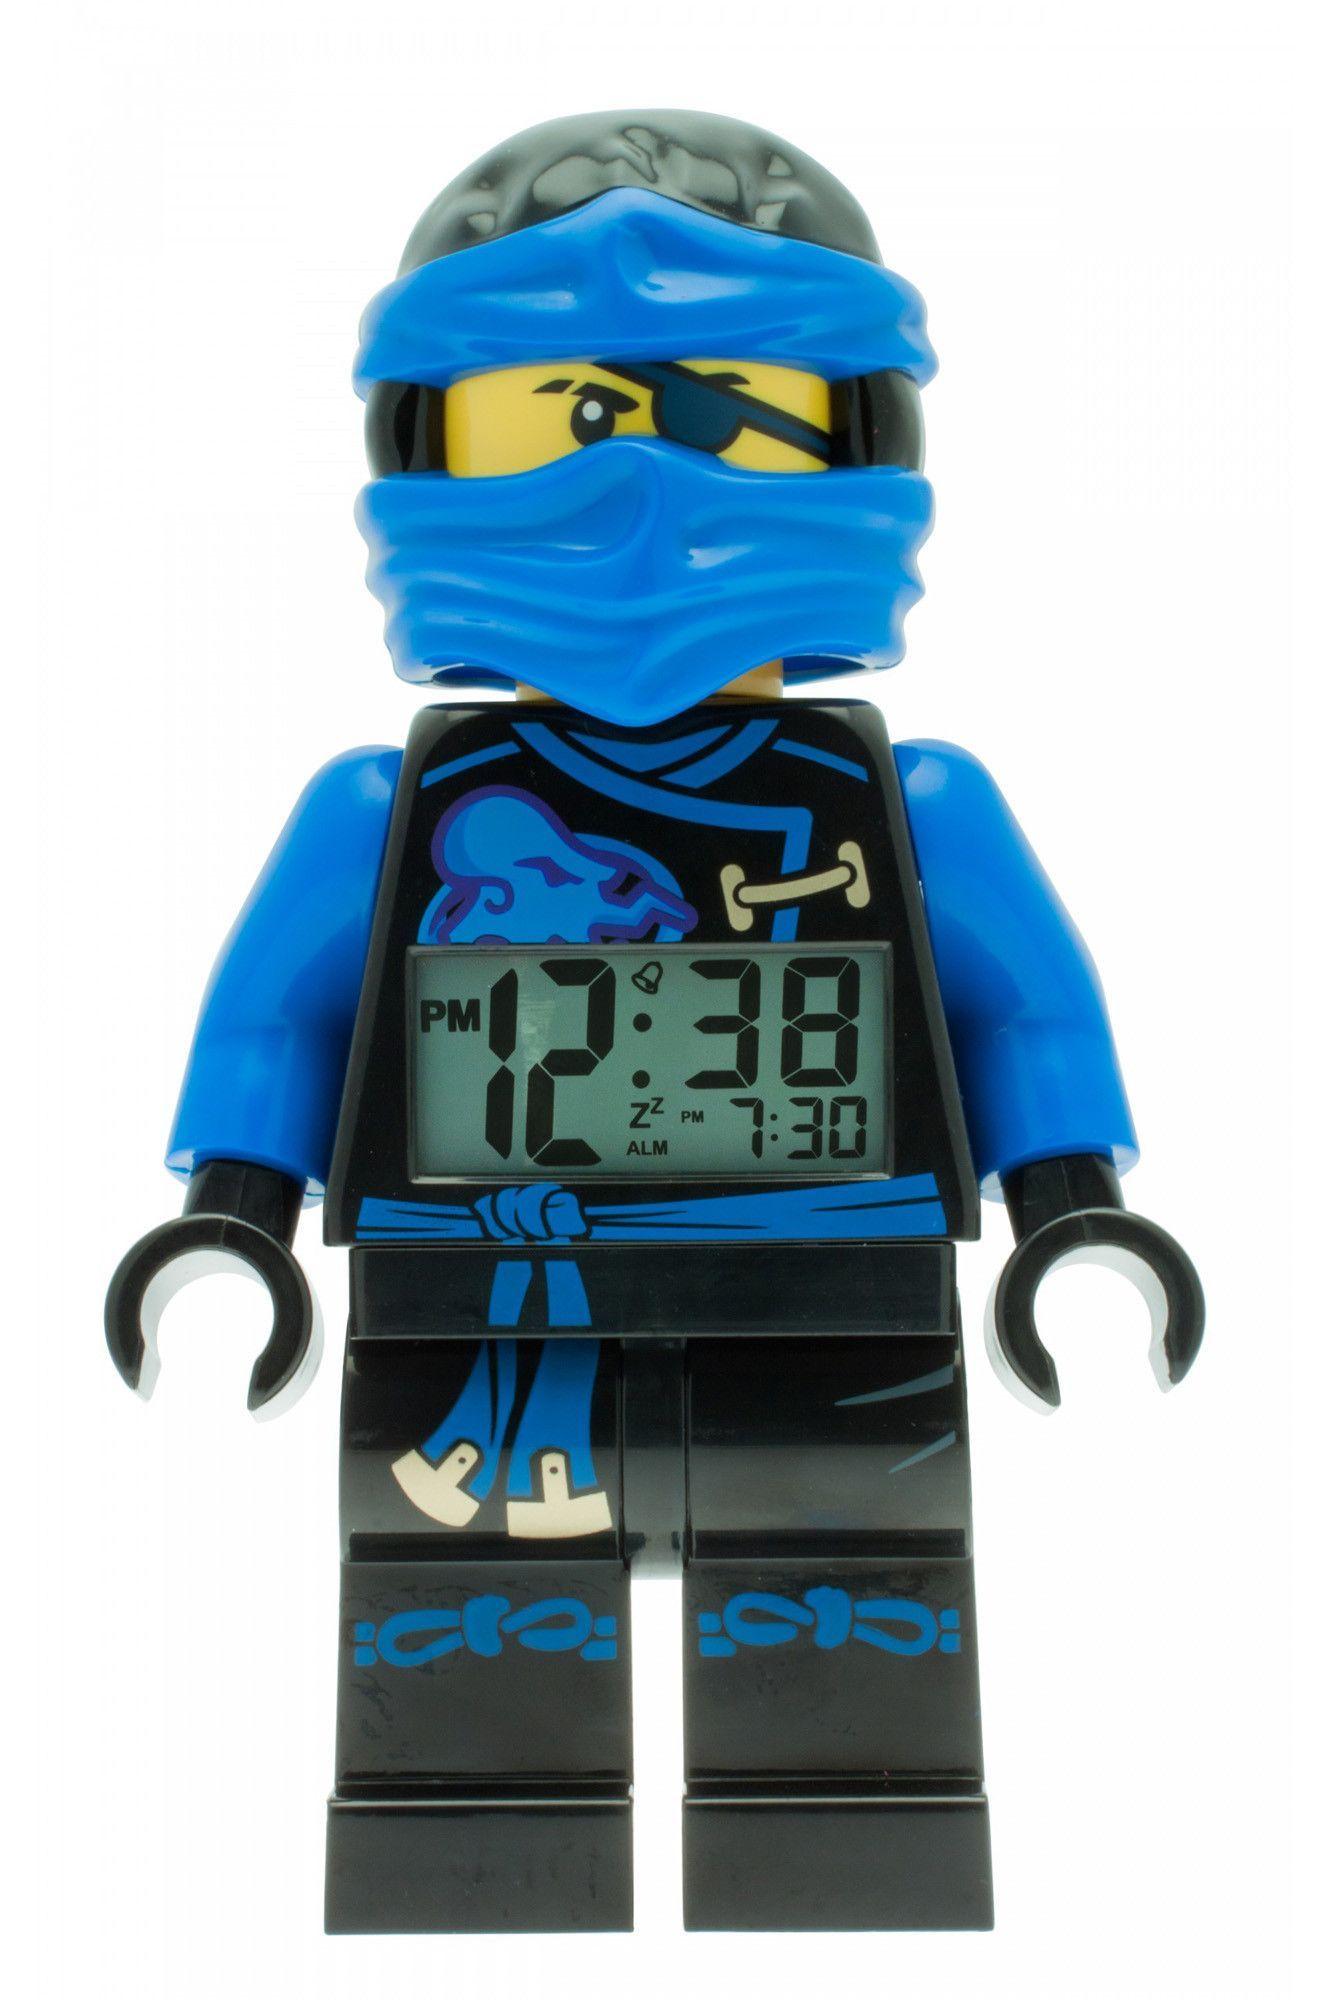 Lego Clock Ninjago Jay Sky Pirates Products Pirate Kids Clock